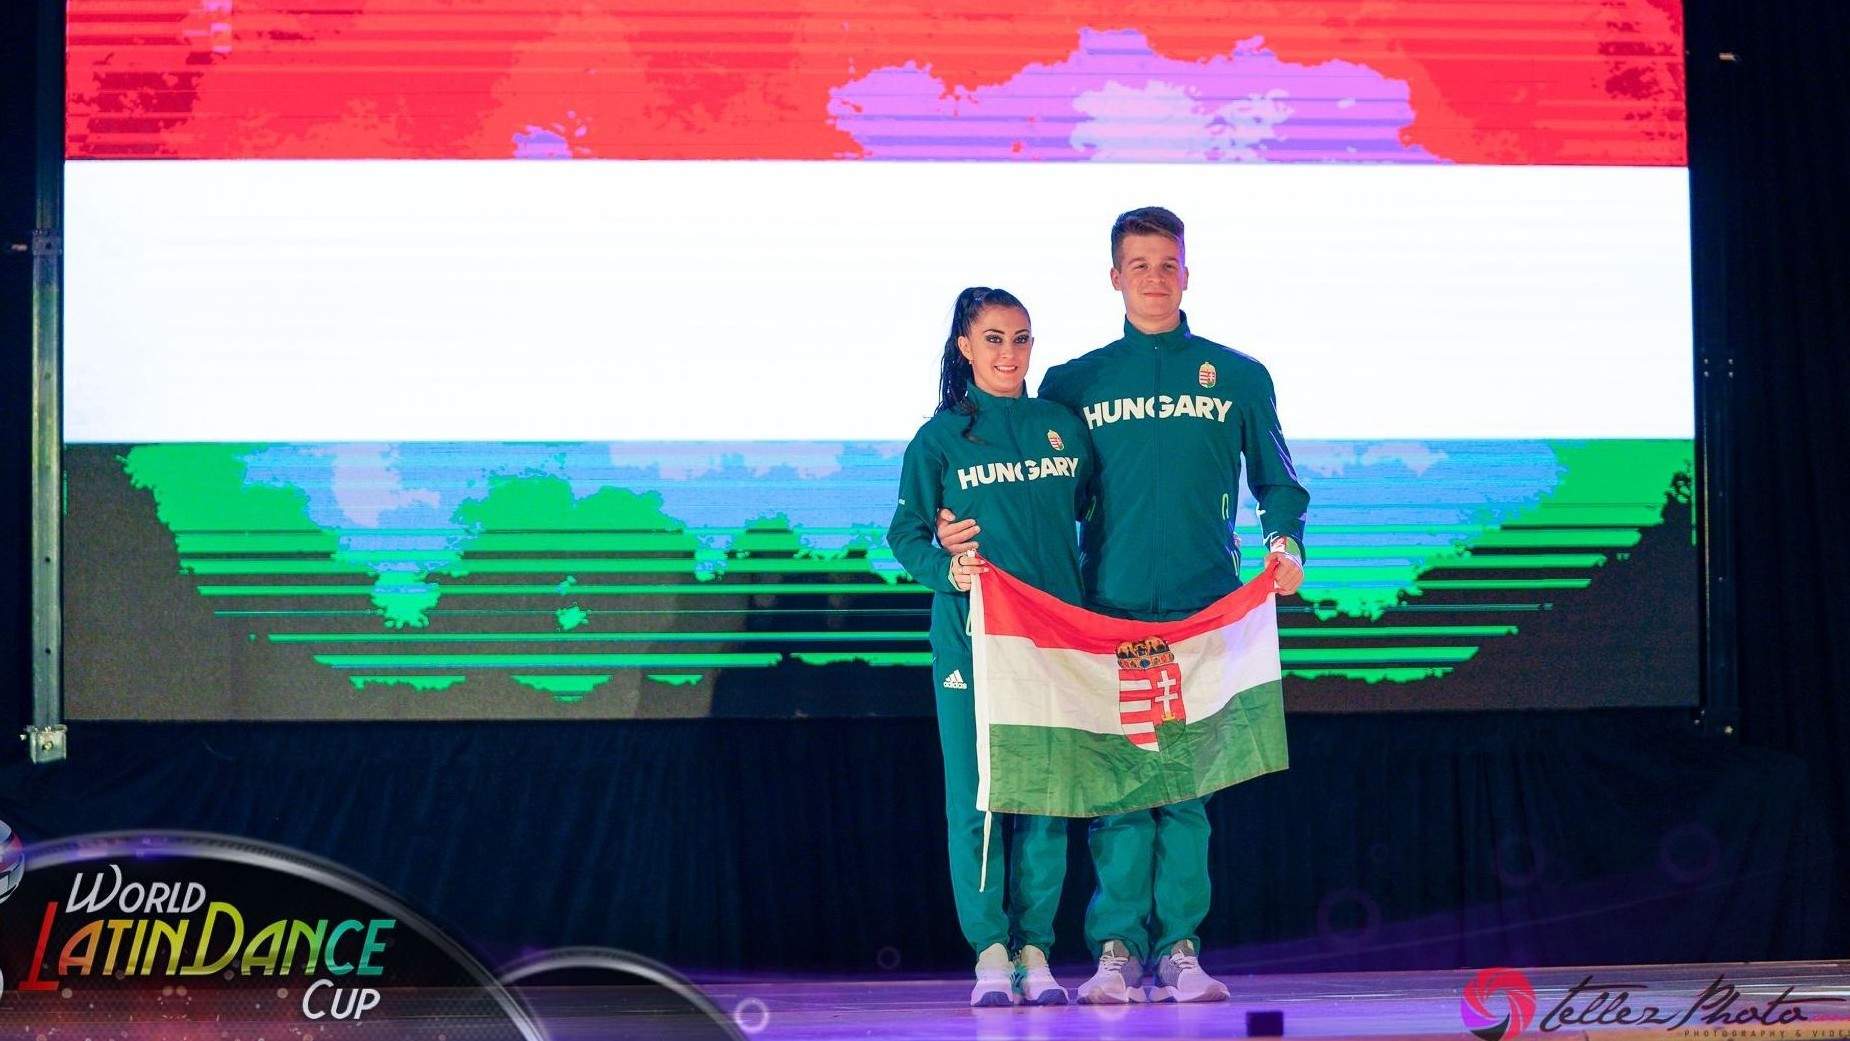 Két magyar arany a World Latin Dance Cup-on